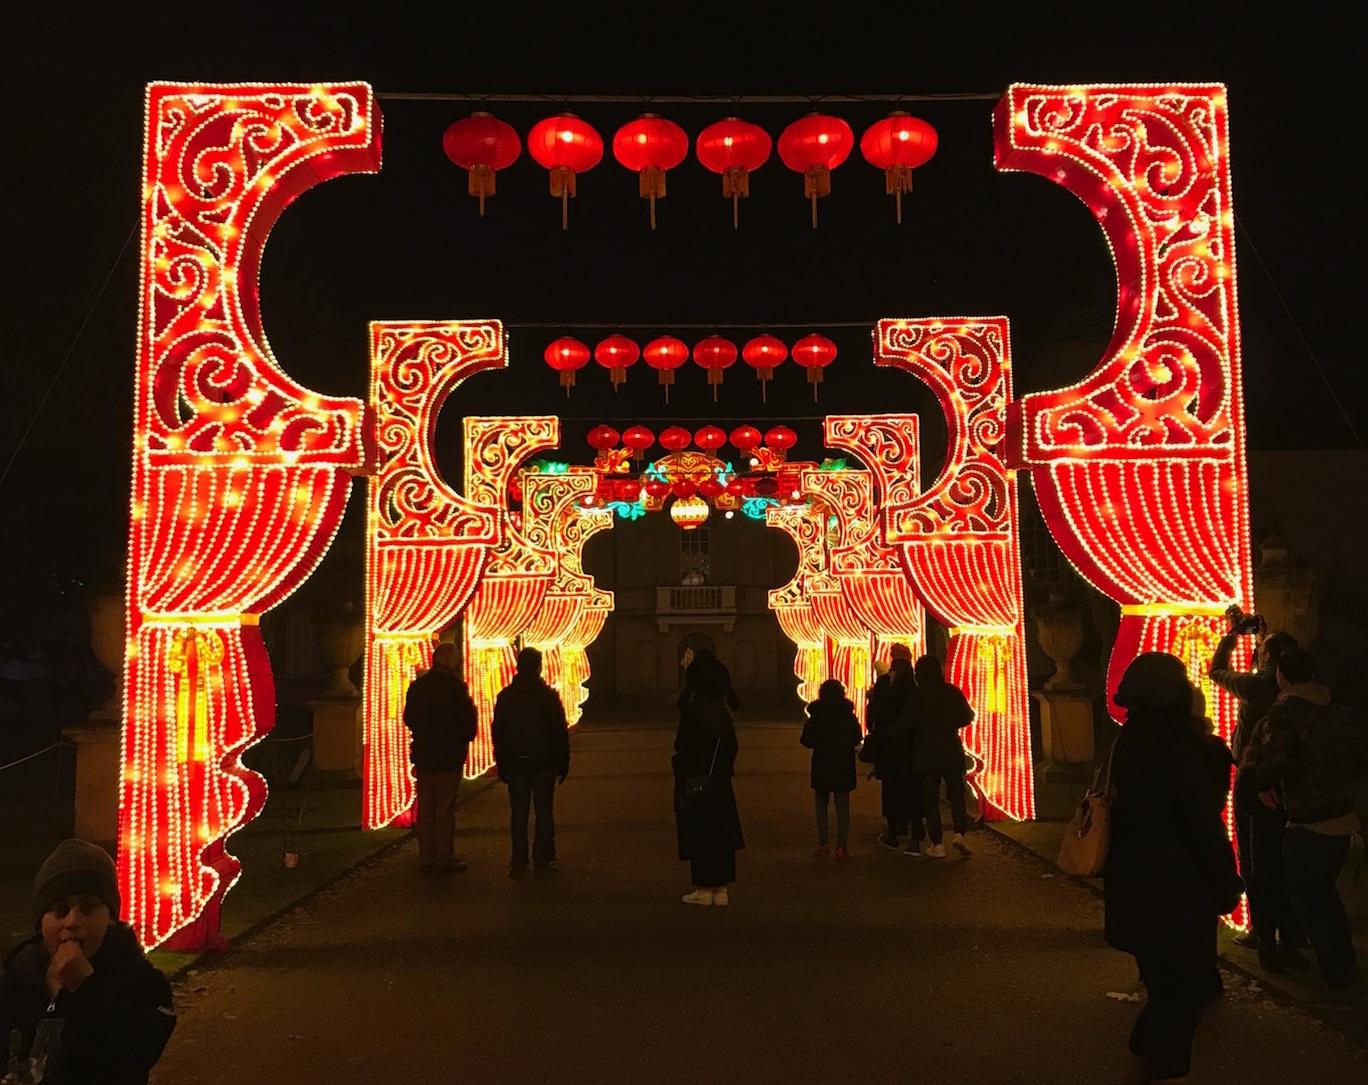 Magical Lantern Festive, London 2017